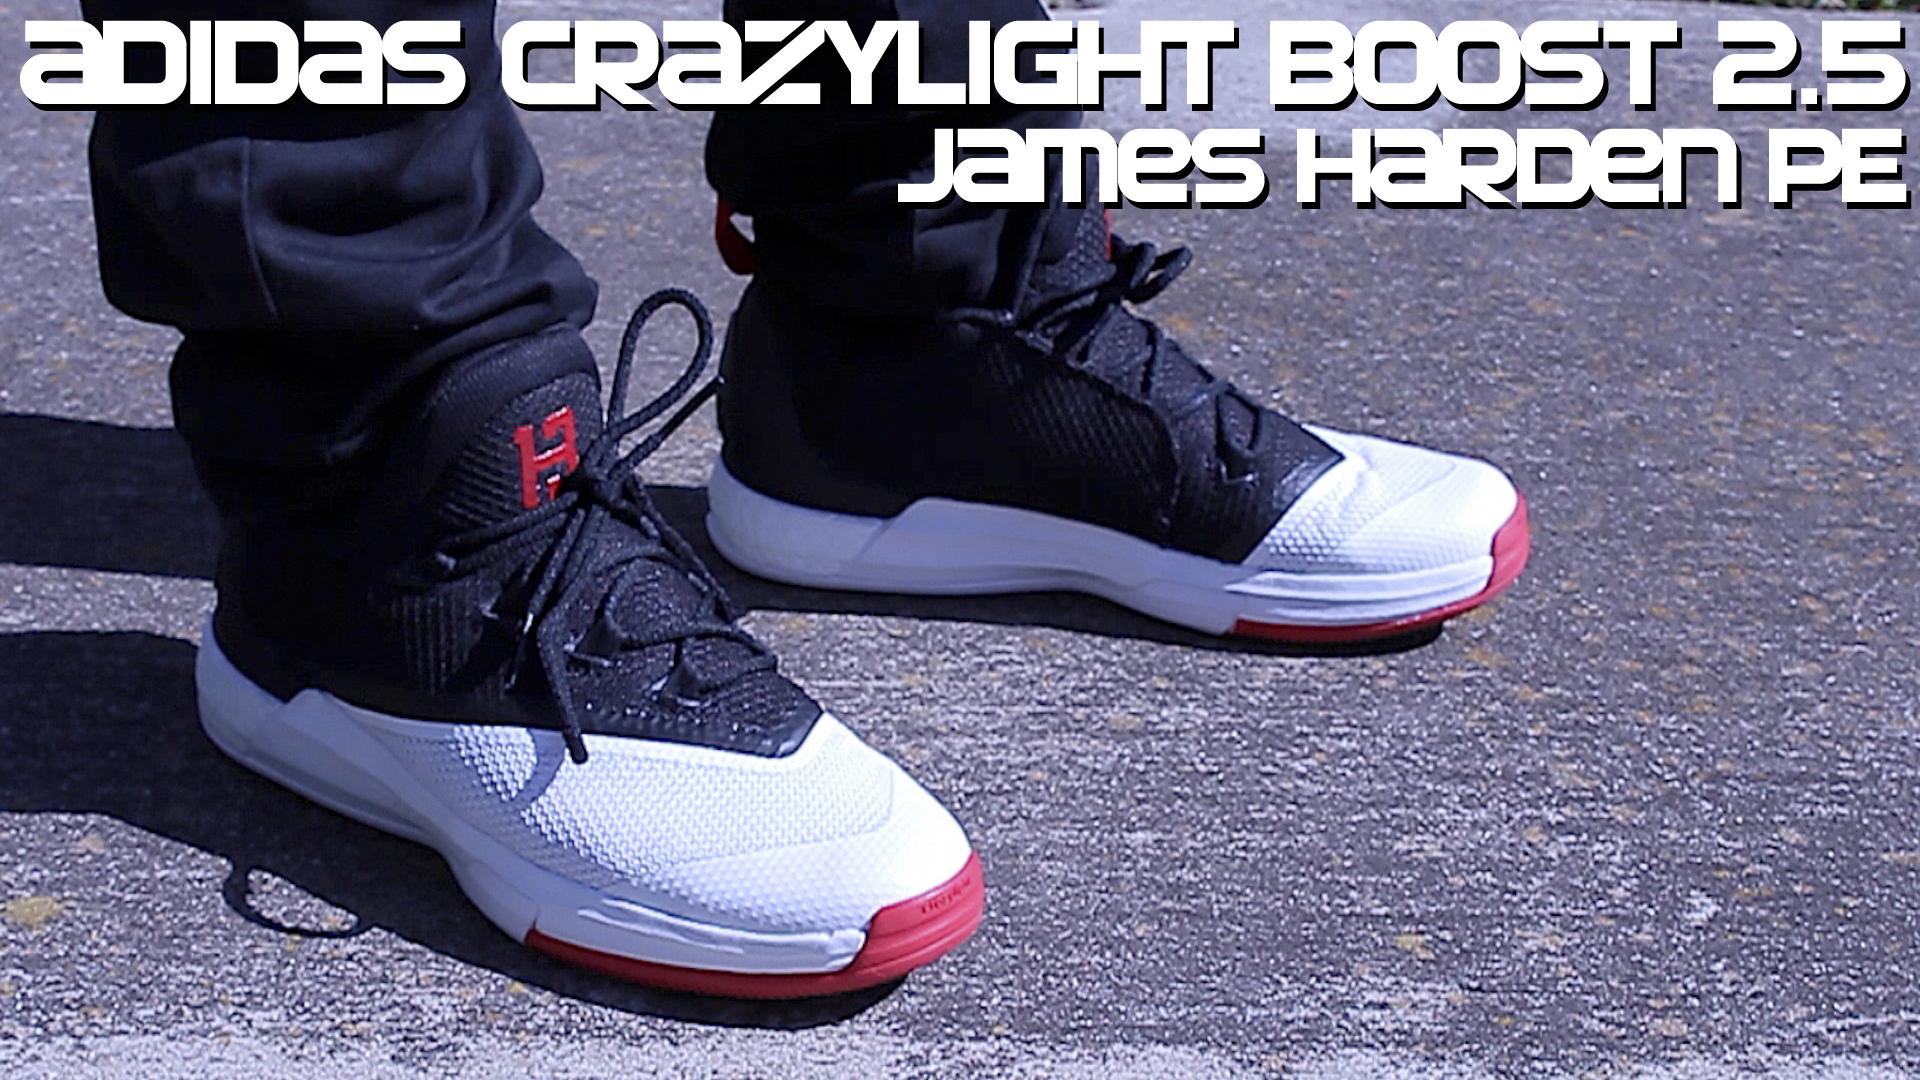 f4c3cc1ad greece adidas crazylight boost 2016 adidas crazylight boost 2016 07ca3  ba8d3  ebay post navigation 14680 96c42